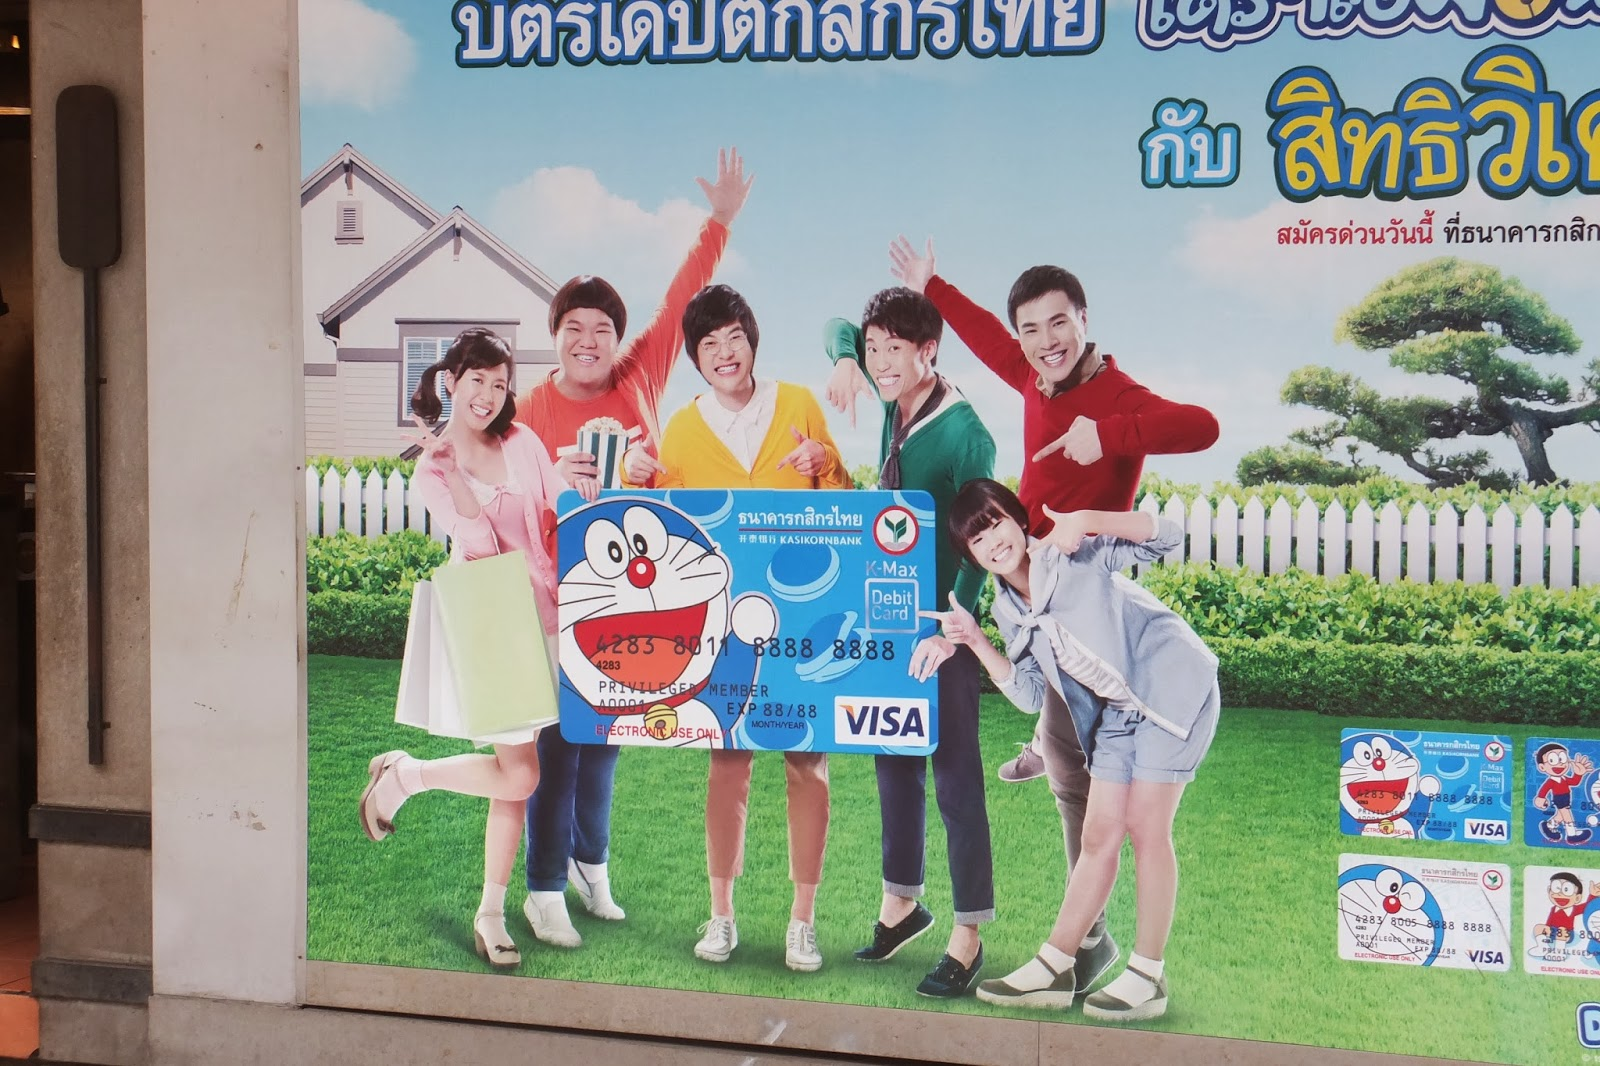 doraemon-in-thailand タイのドラえもんと仲間(実写)